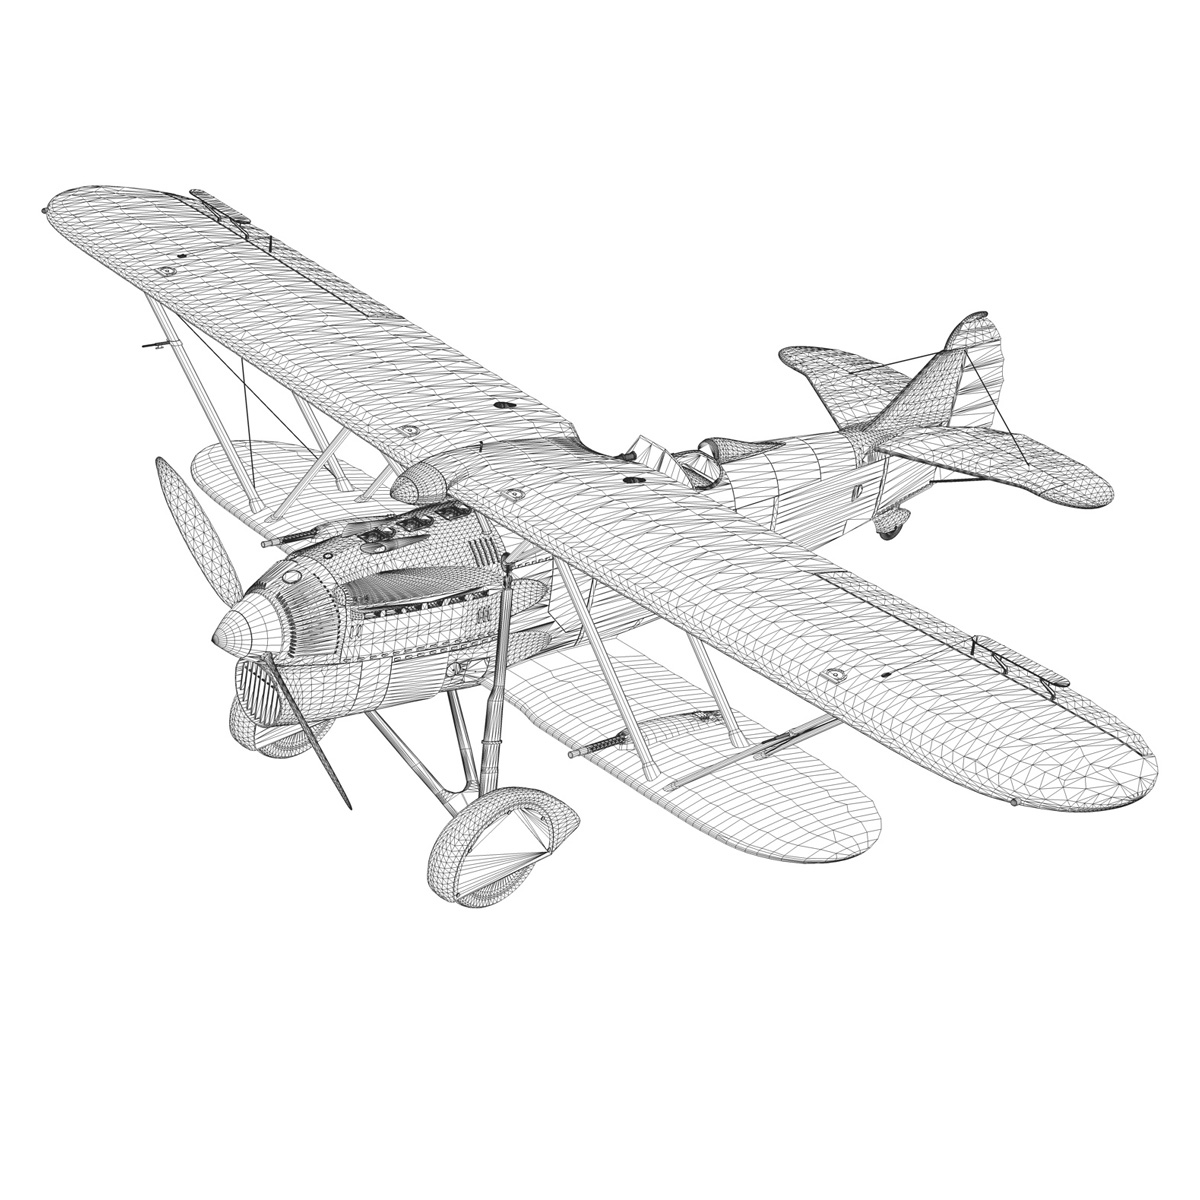 fiat cr.32 – italy airforce – 154 squadriglia 3d model fbx c4d lwo obj 268148